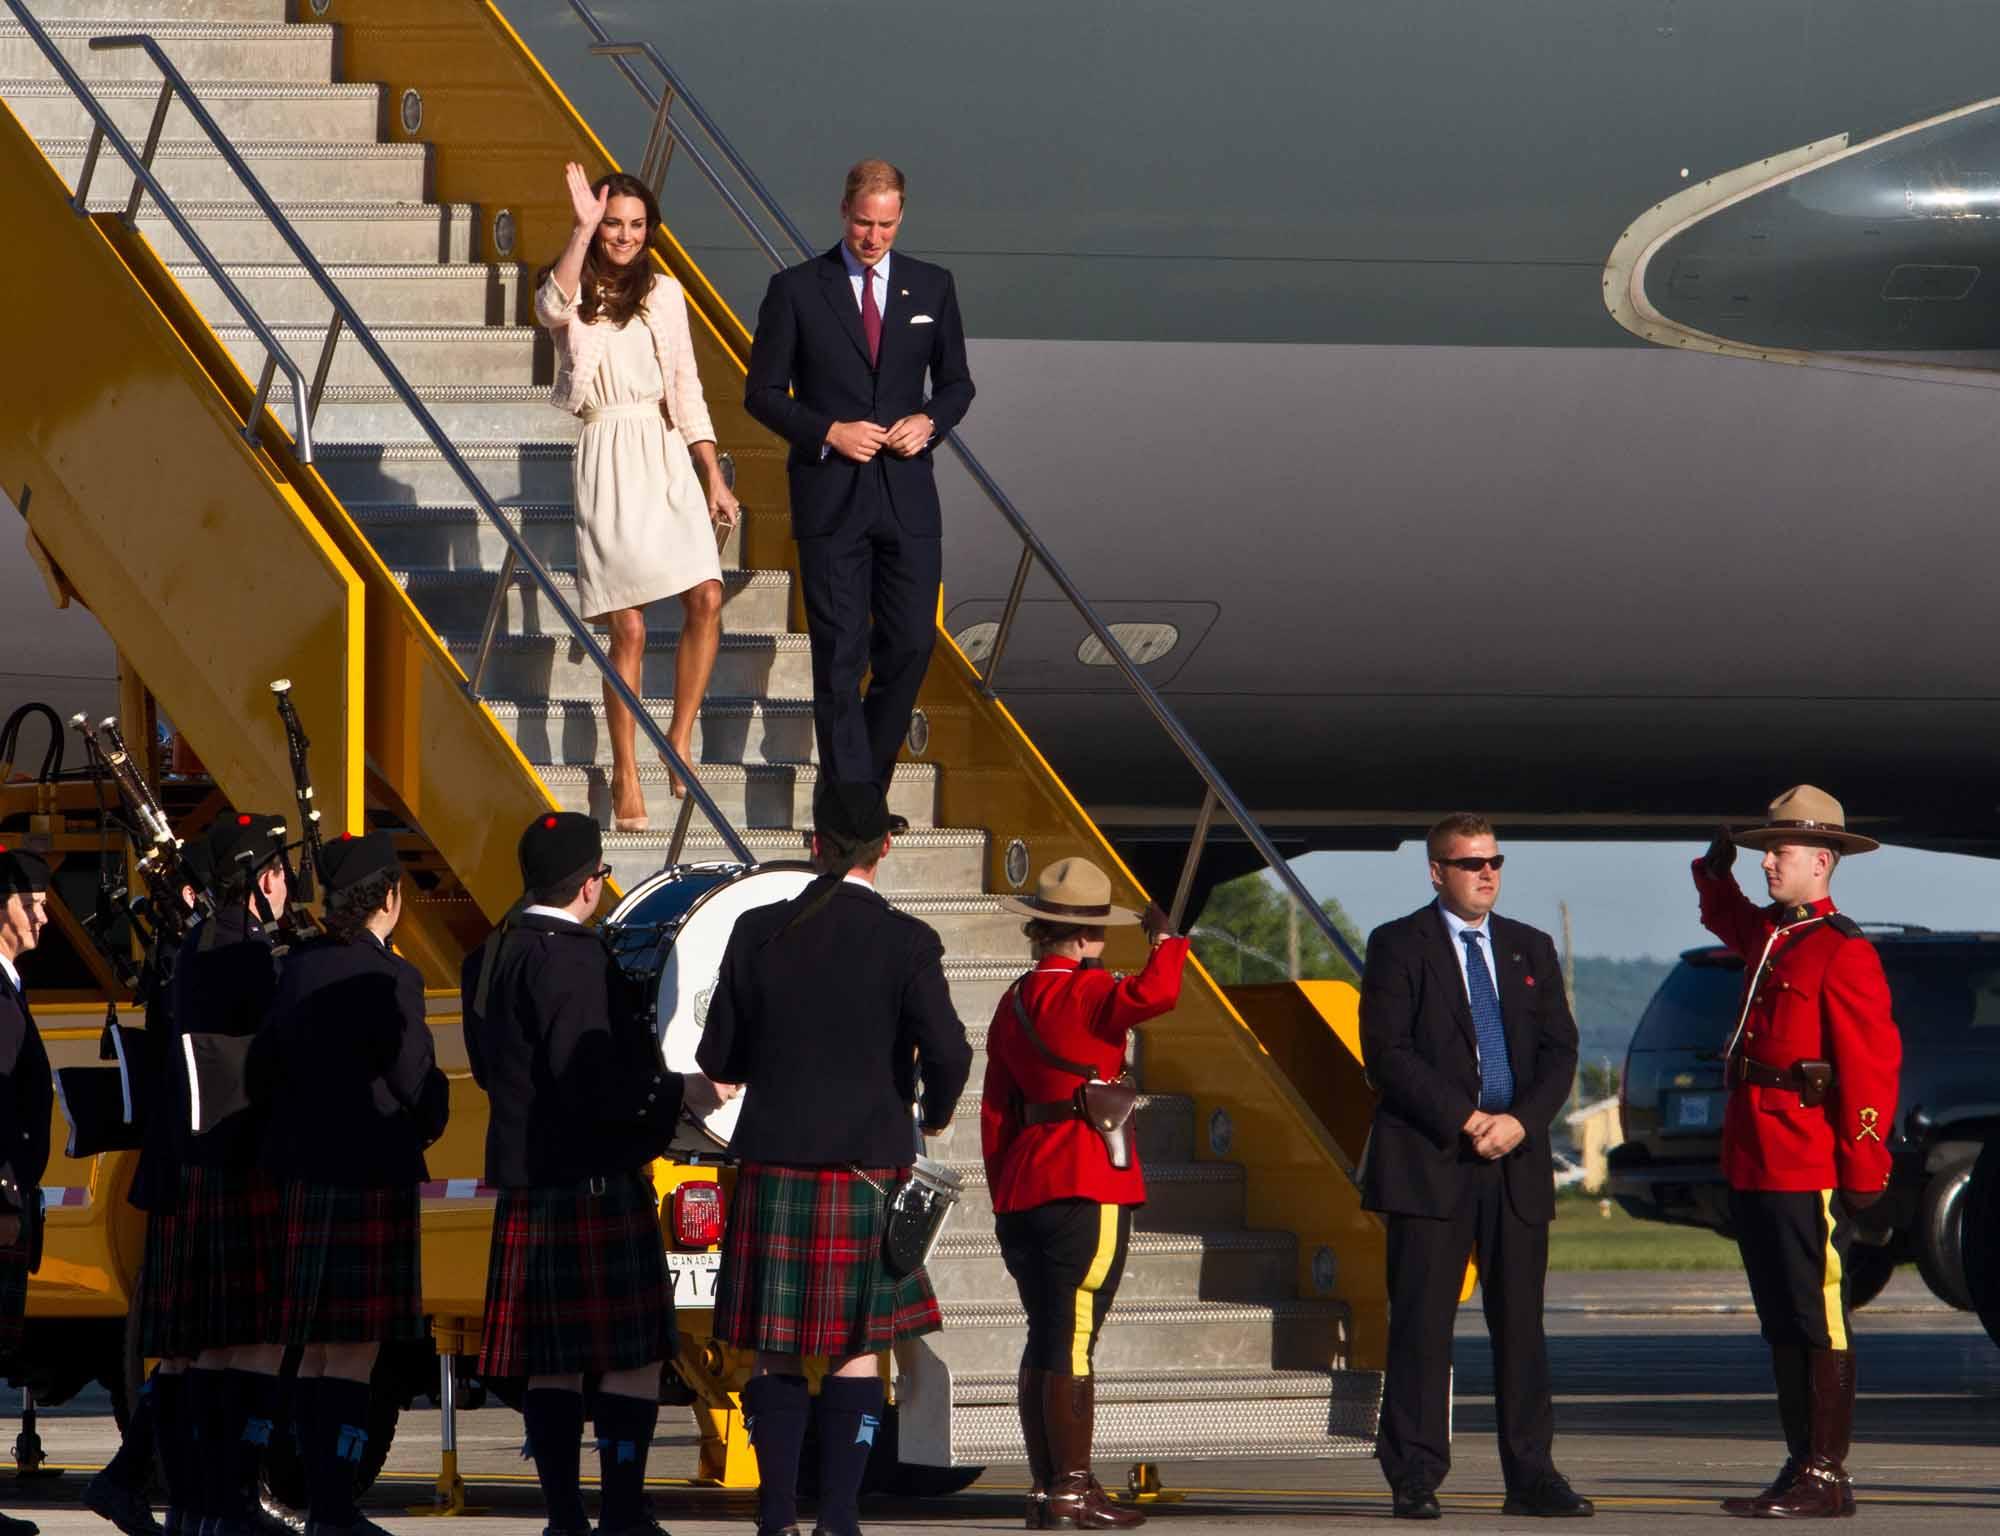 Will & Kate: The Duke and Duchess of Cambridge